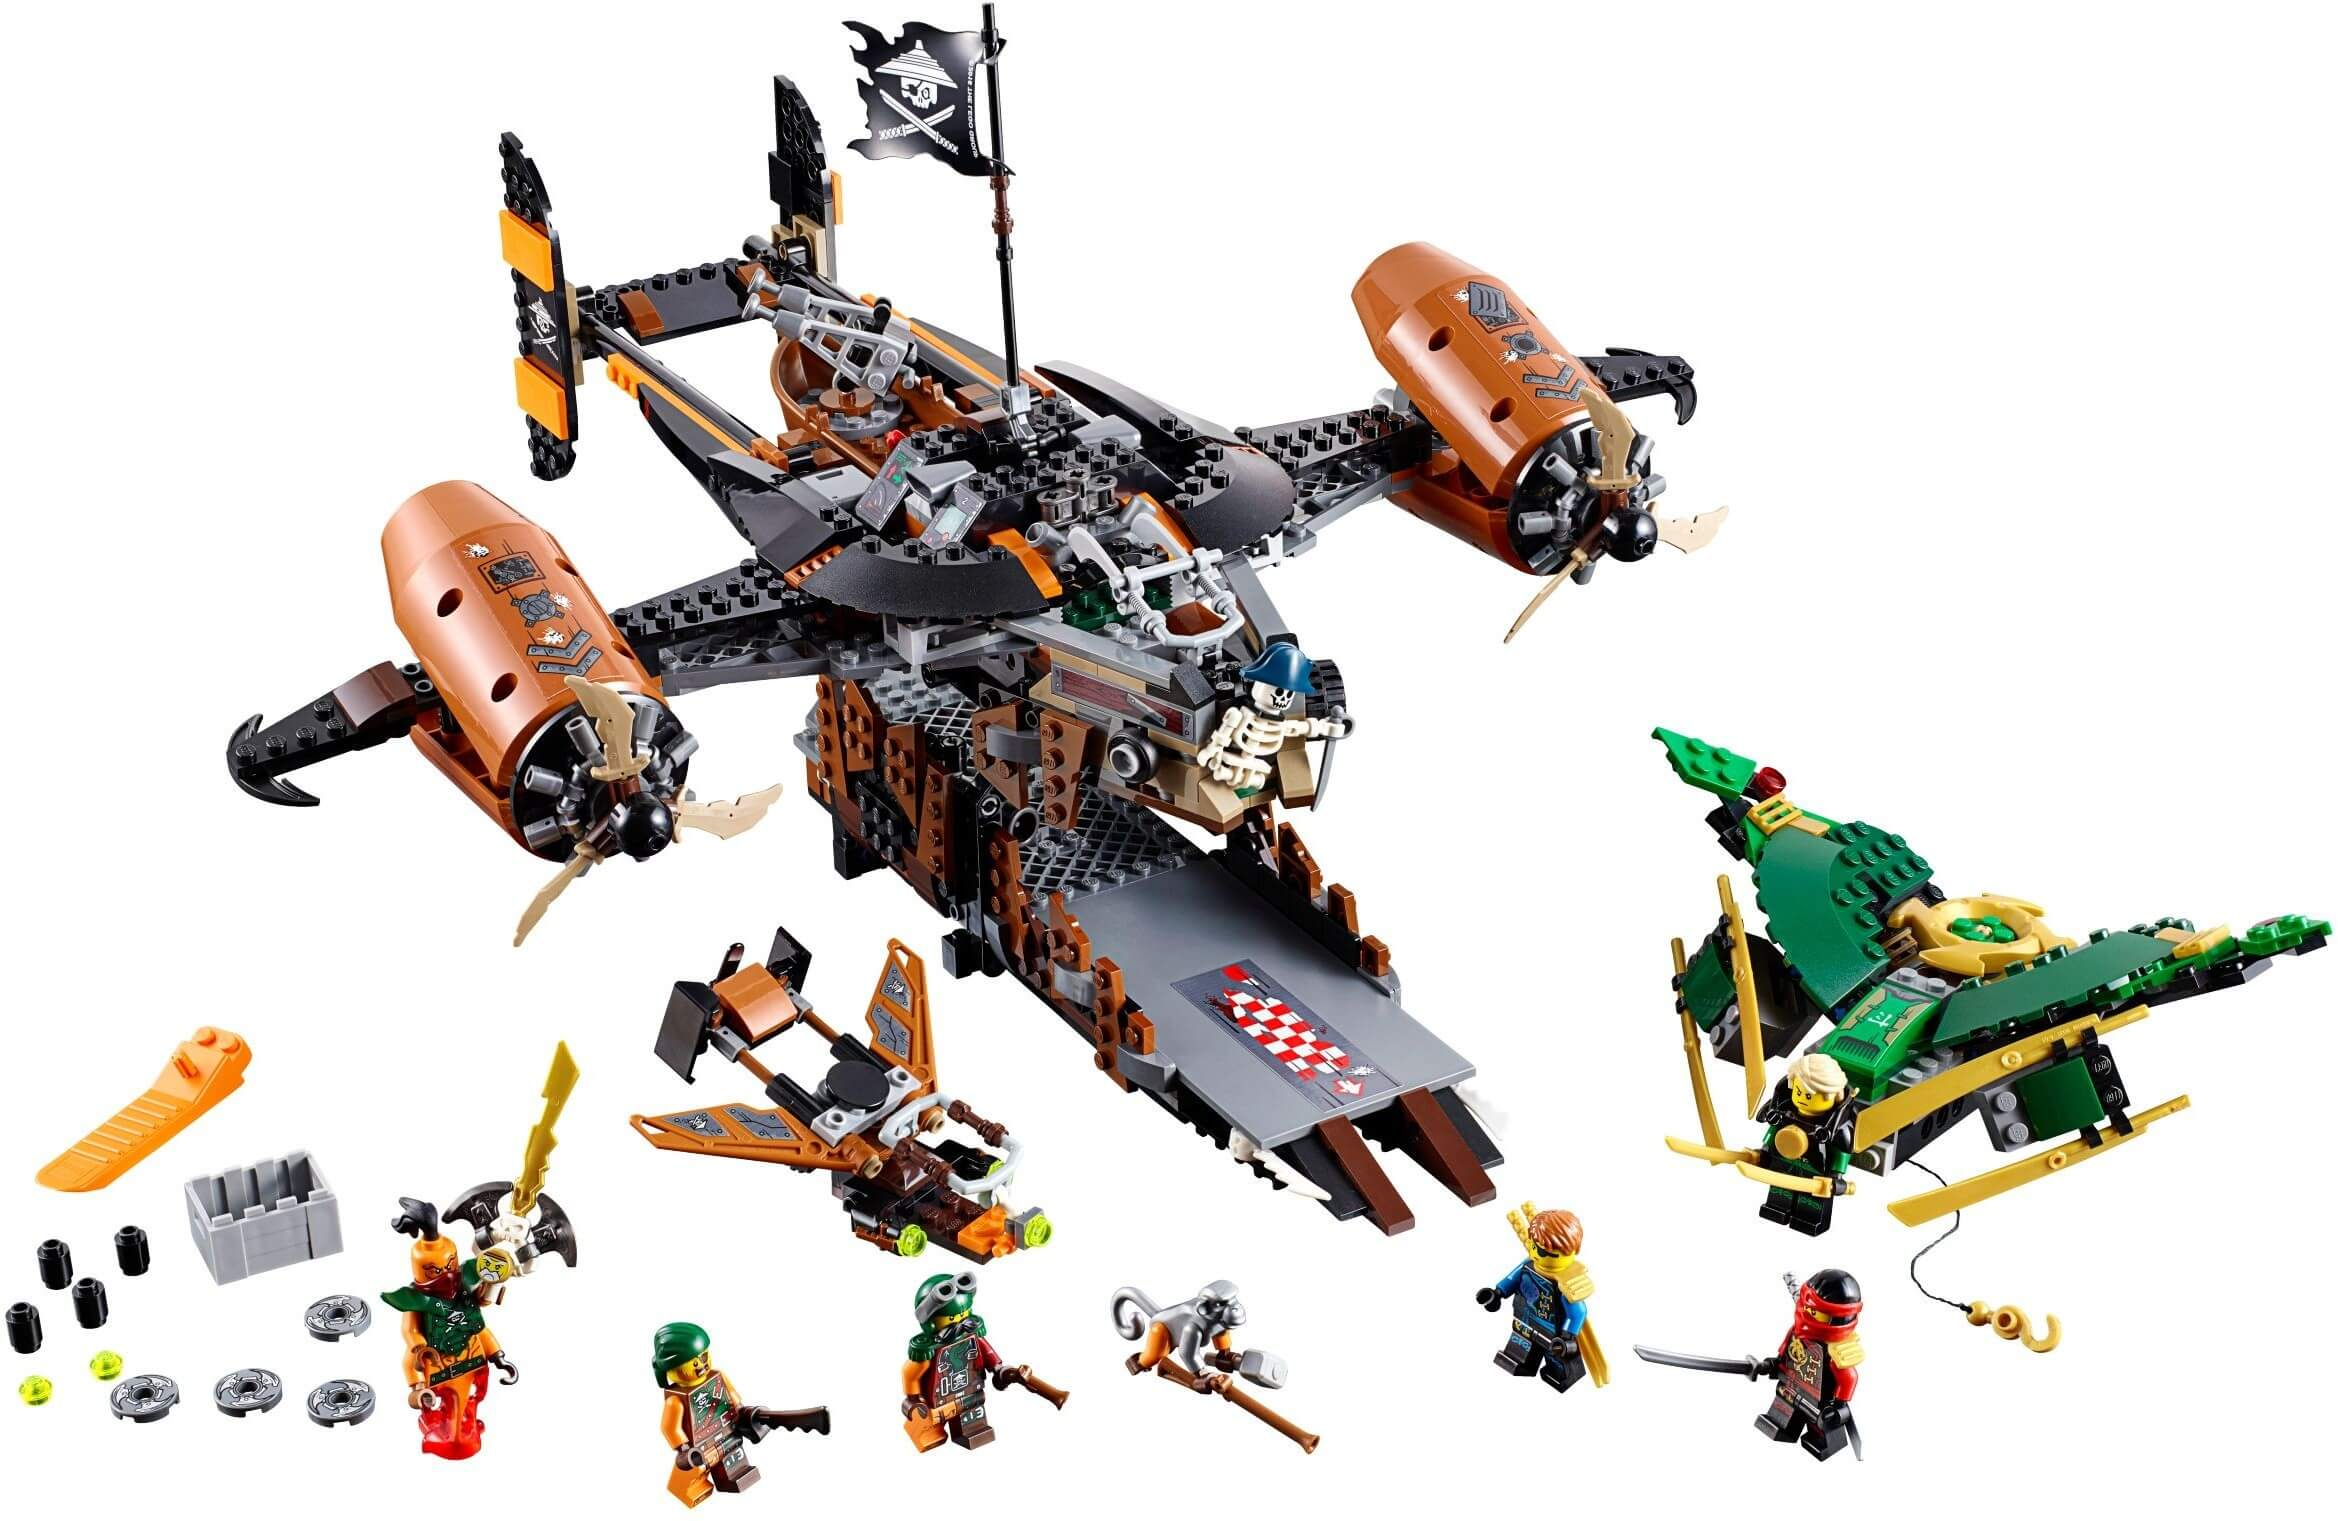 Mua đồ chơi LEGO 70605 - LEGO Ninjago 70605 - Pháo đài bay Misfortune's Keep (LEGO Ninjago Misfortune's Keep 70605)